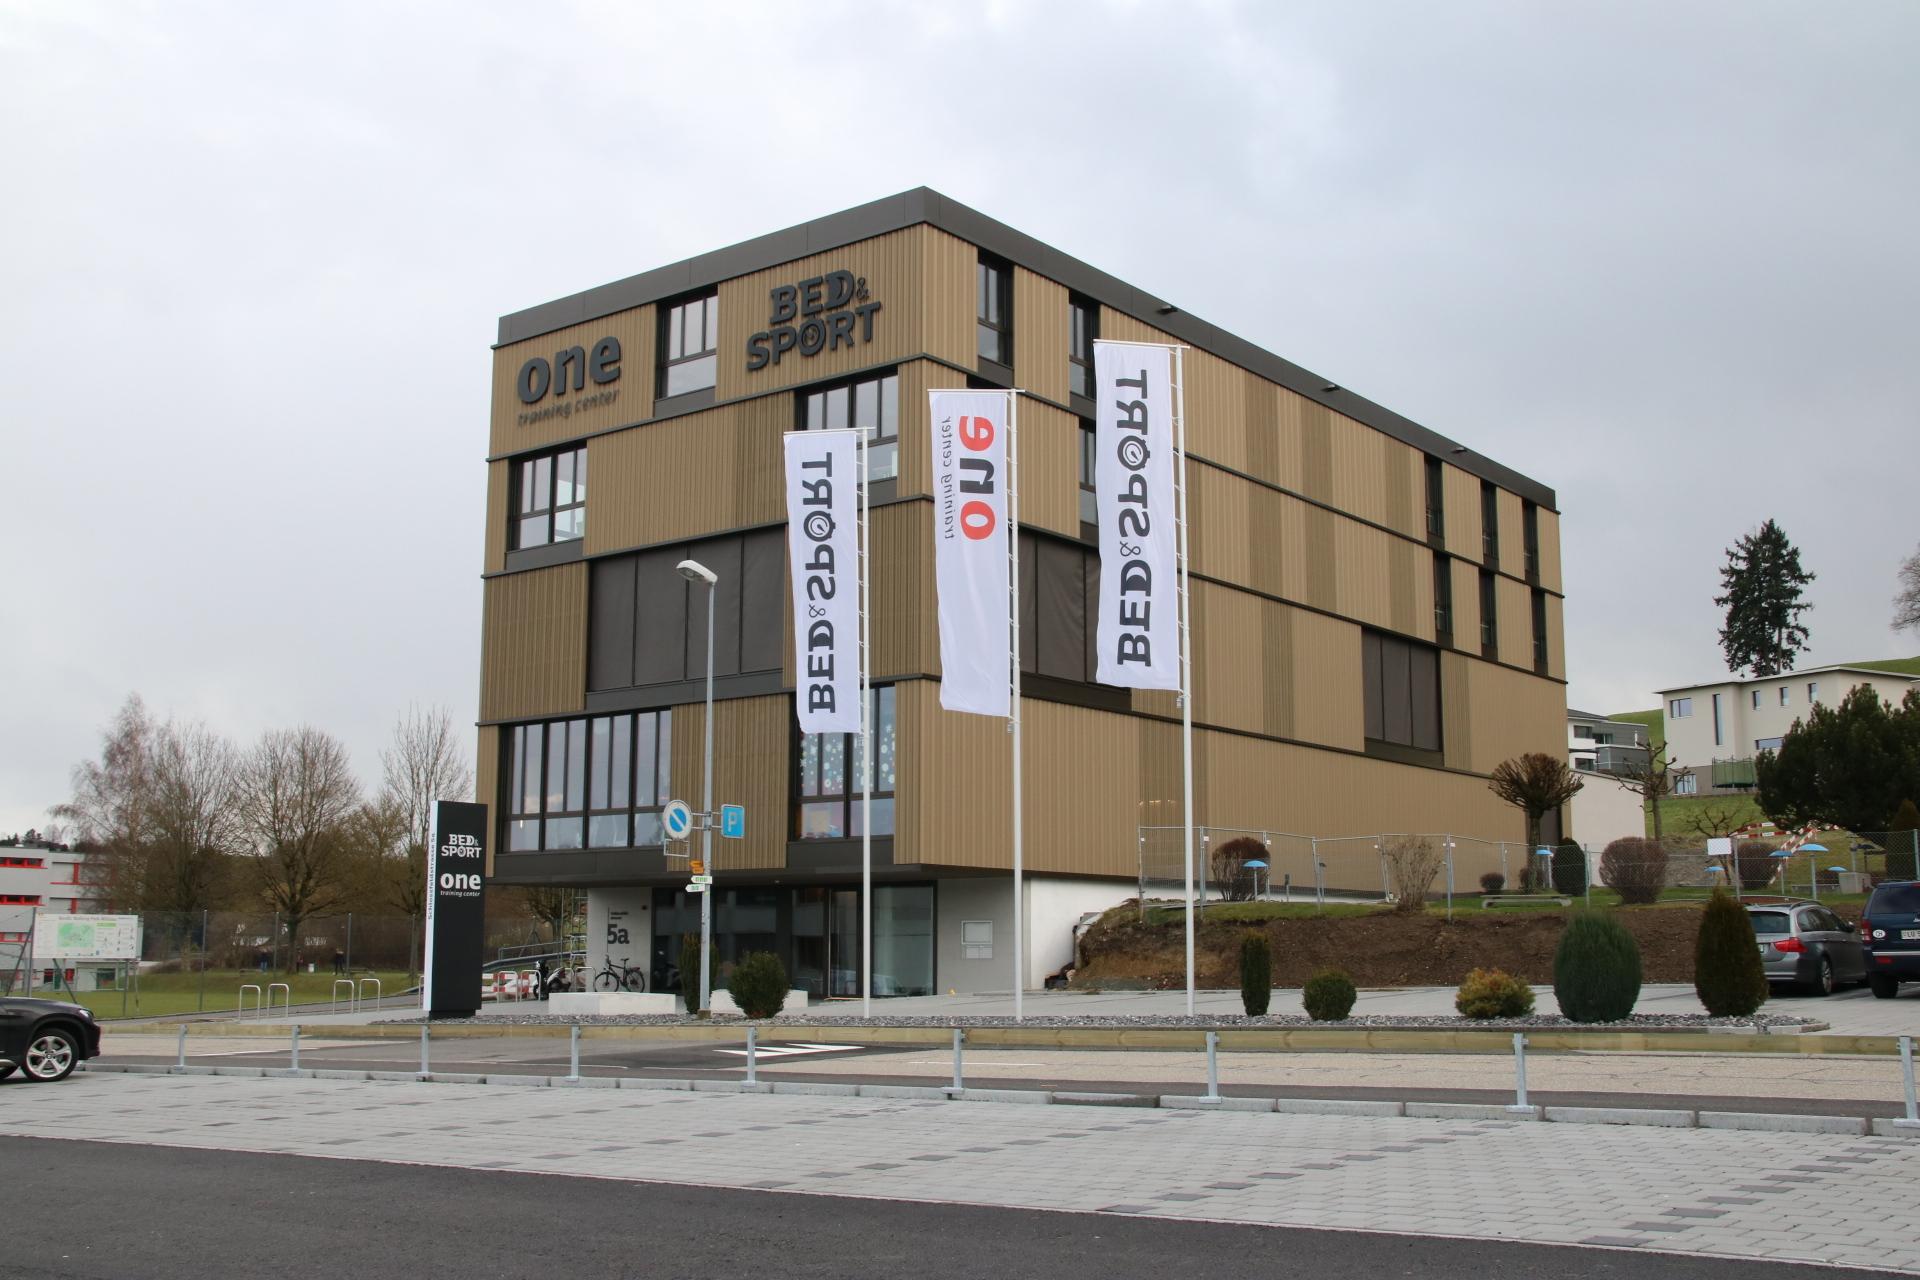 Bed&Sport Willisau – Sportlerunterkunft Schlossfeld Willisau